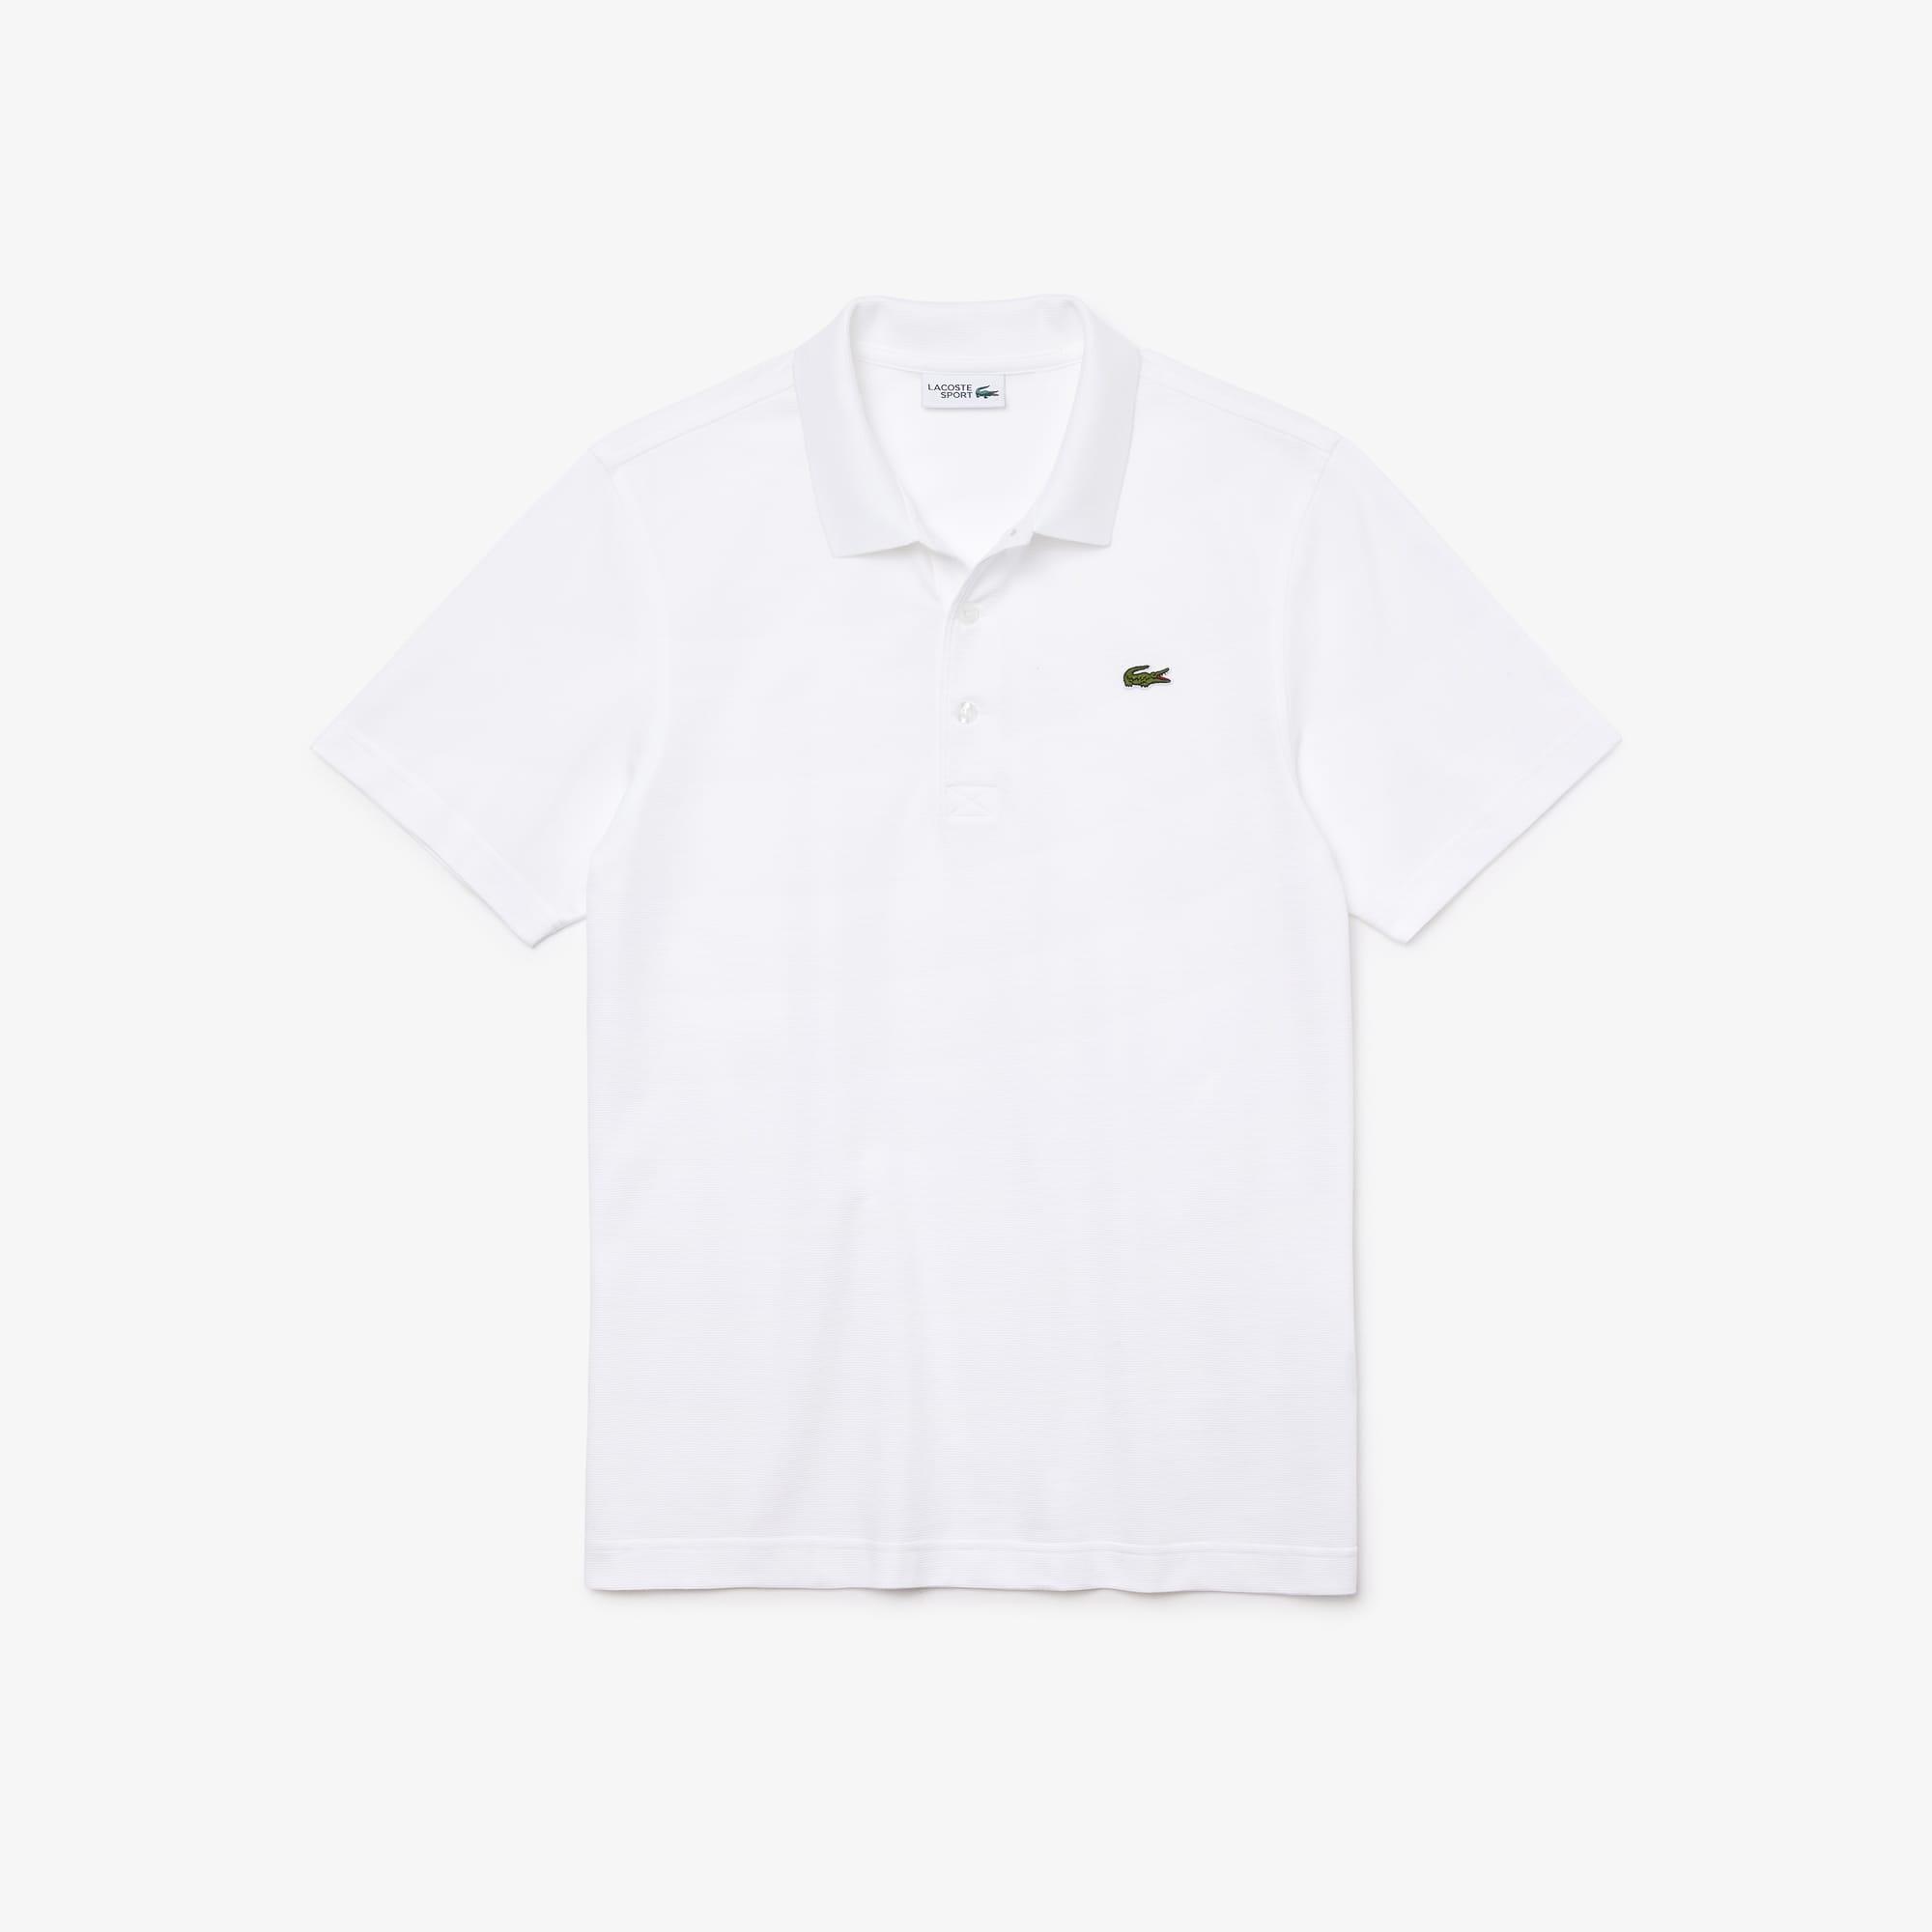 925c558be6 Camisa Polo Lacoste Sport Tennis Regular Fit Masculina em Malha Superleve